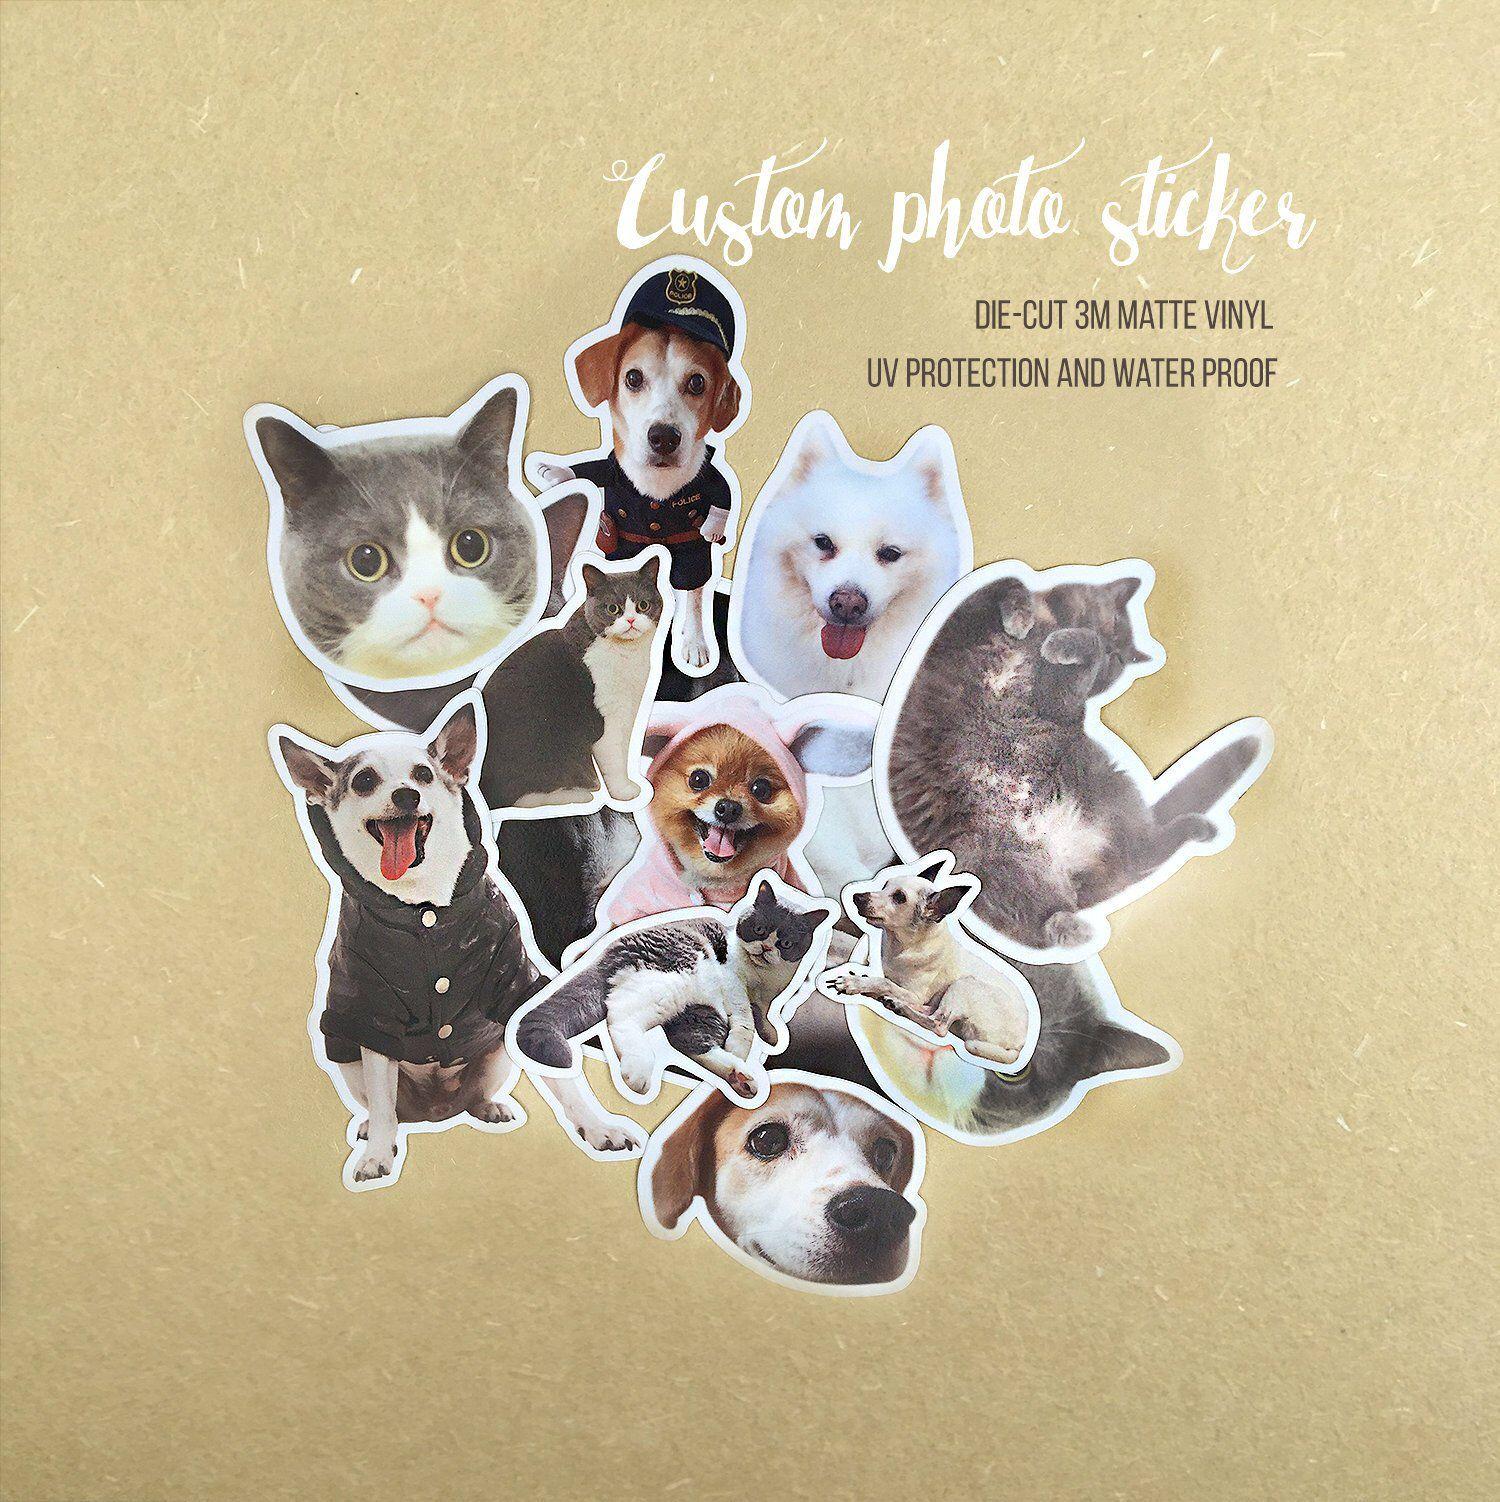 Cat Stickers Vinyl Custom Stickers Cute Custom Stickers Waterproof Custom Stickers Dog Stickers Pet Stickers